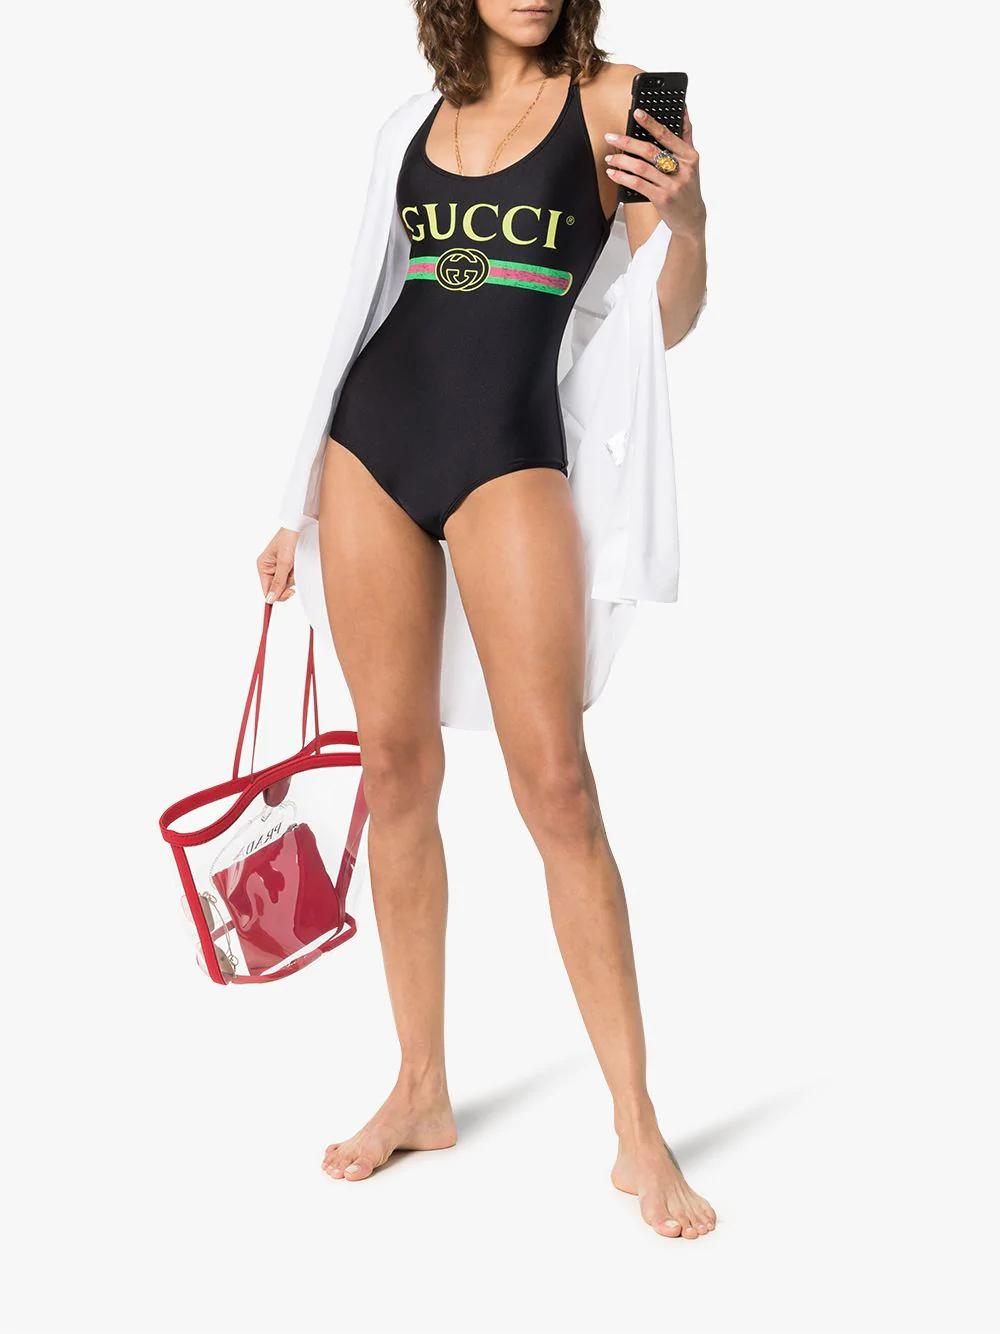 Gucci Black Logo Nylon One-piece Swimsuit In Black Sparkling Stretch Fabric